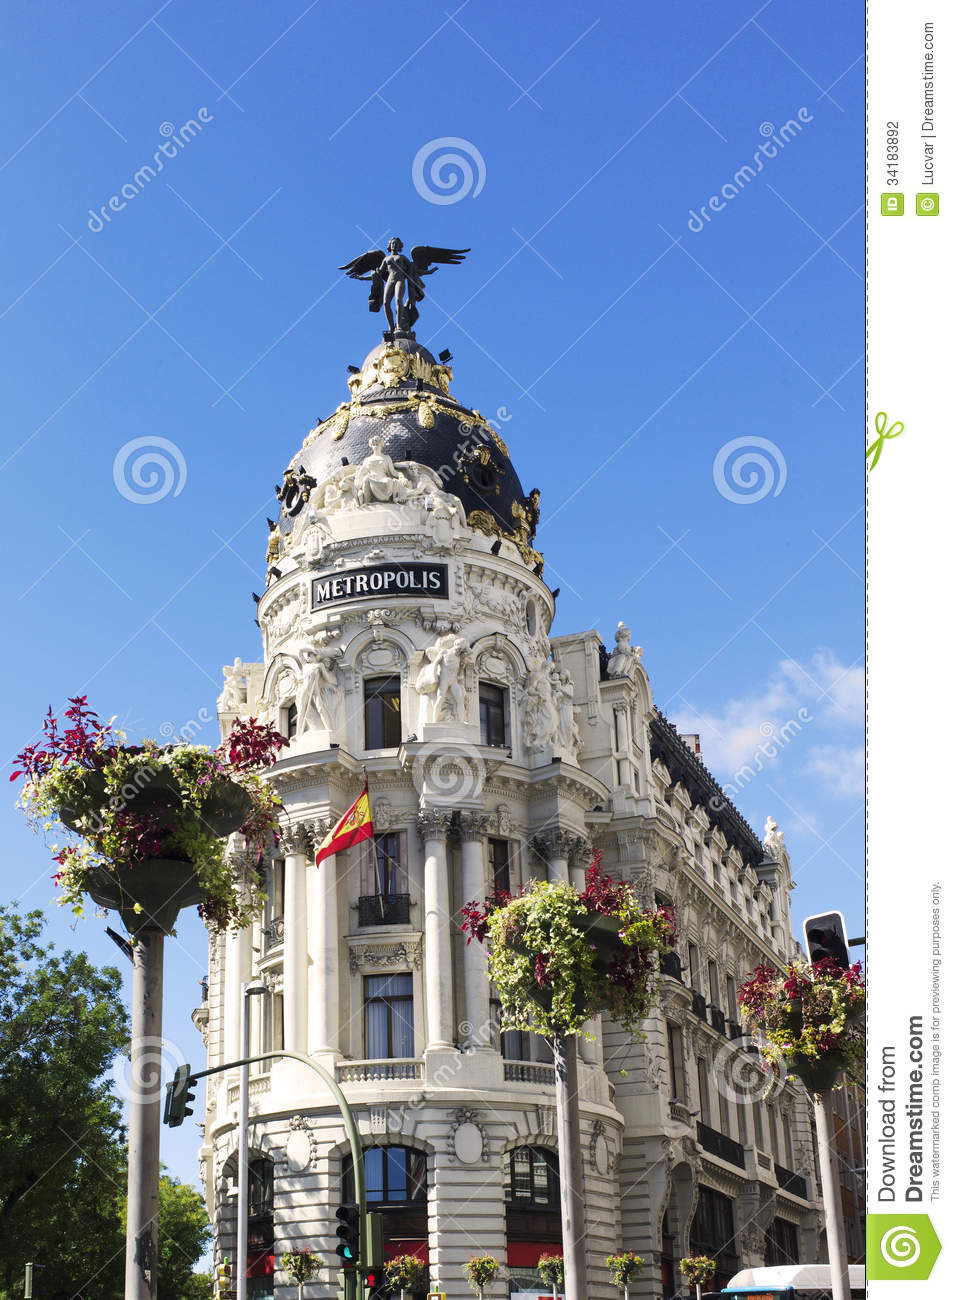 Metropolis Building. Gran Via. Madrid. Spain Stock Photography.